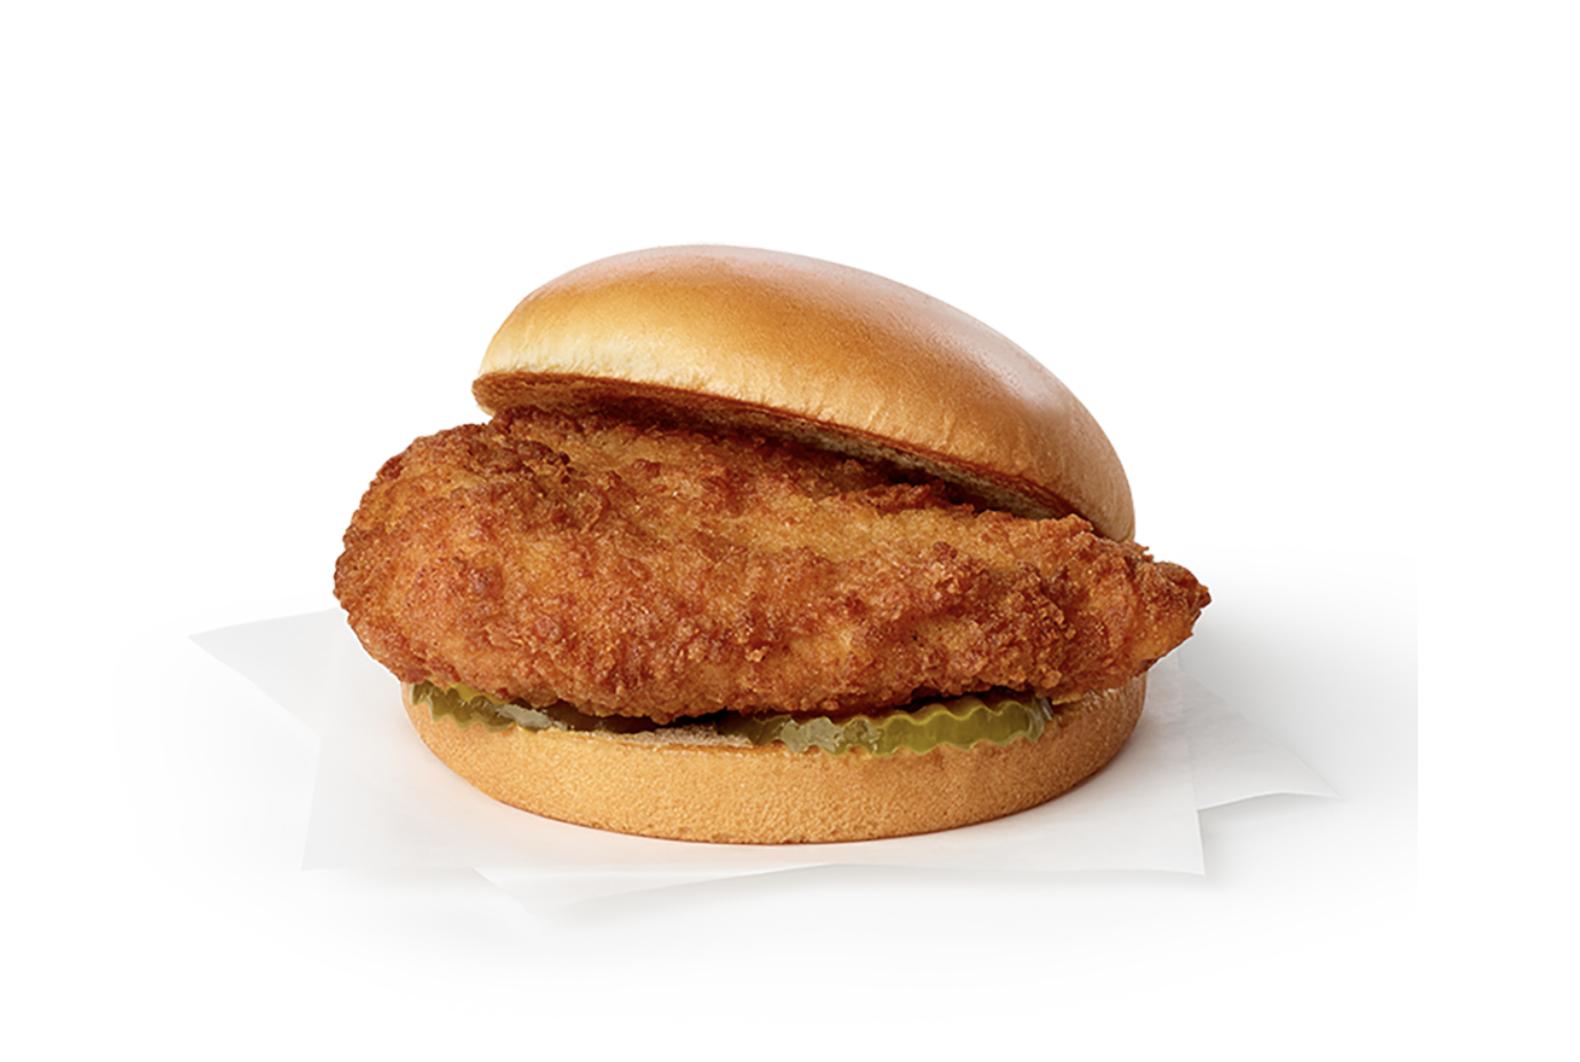 A chicken sandwich with pickles